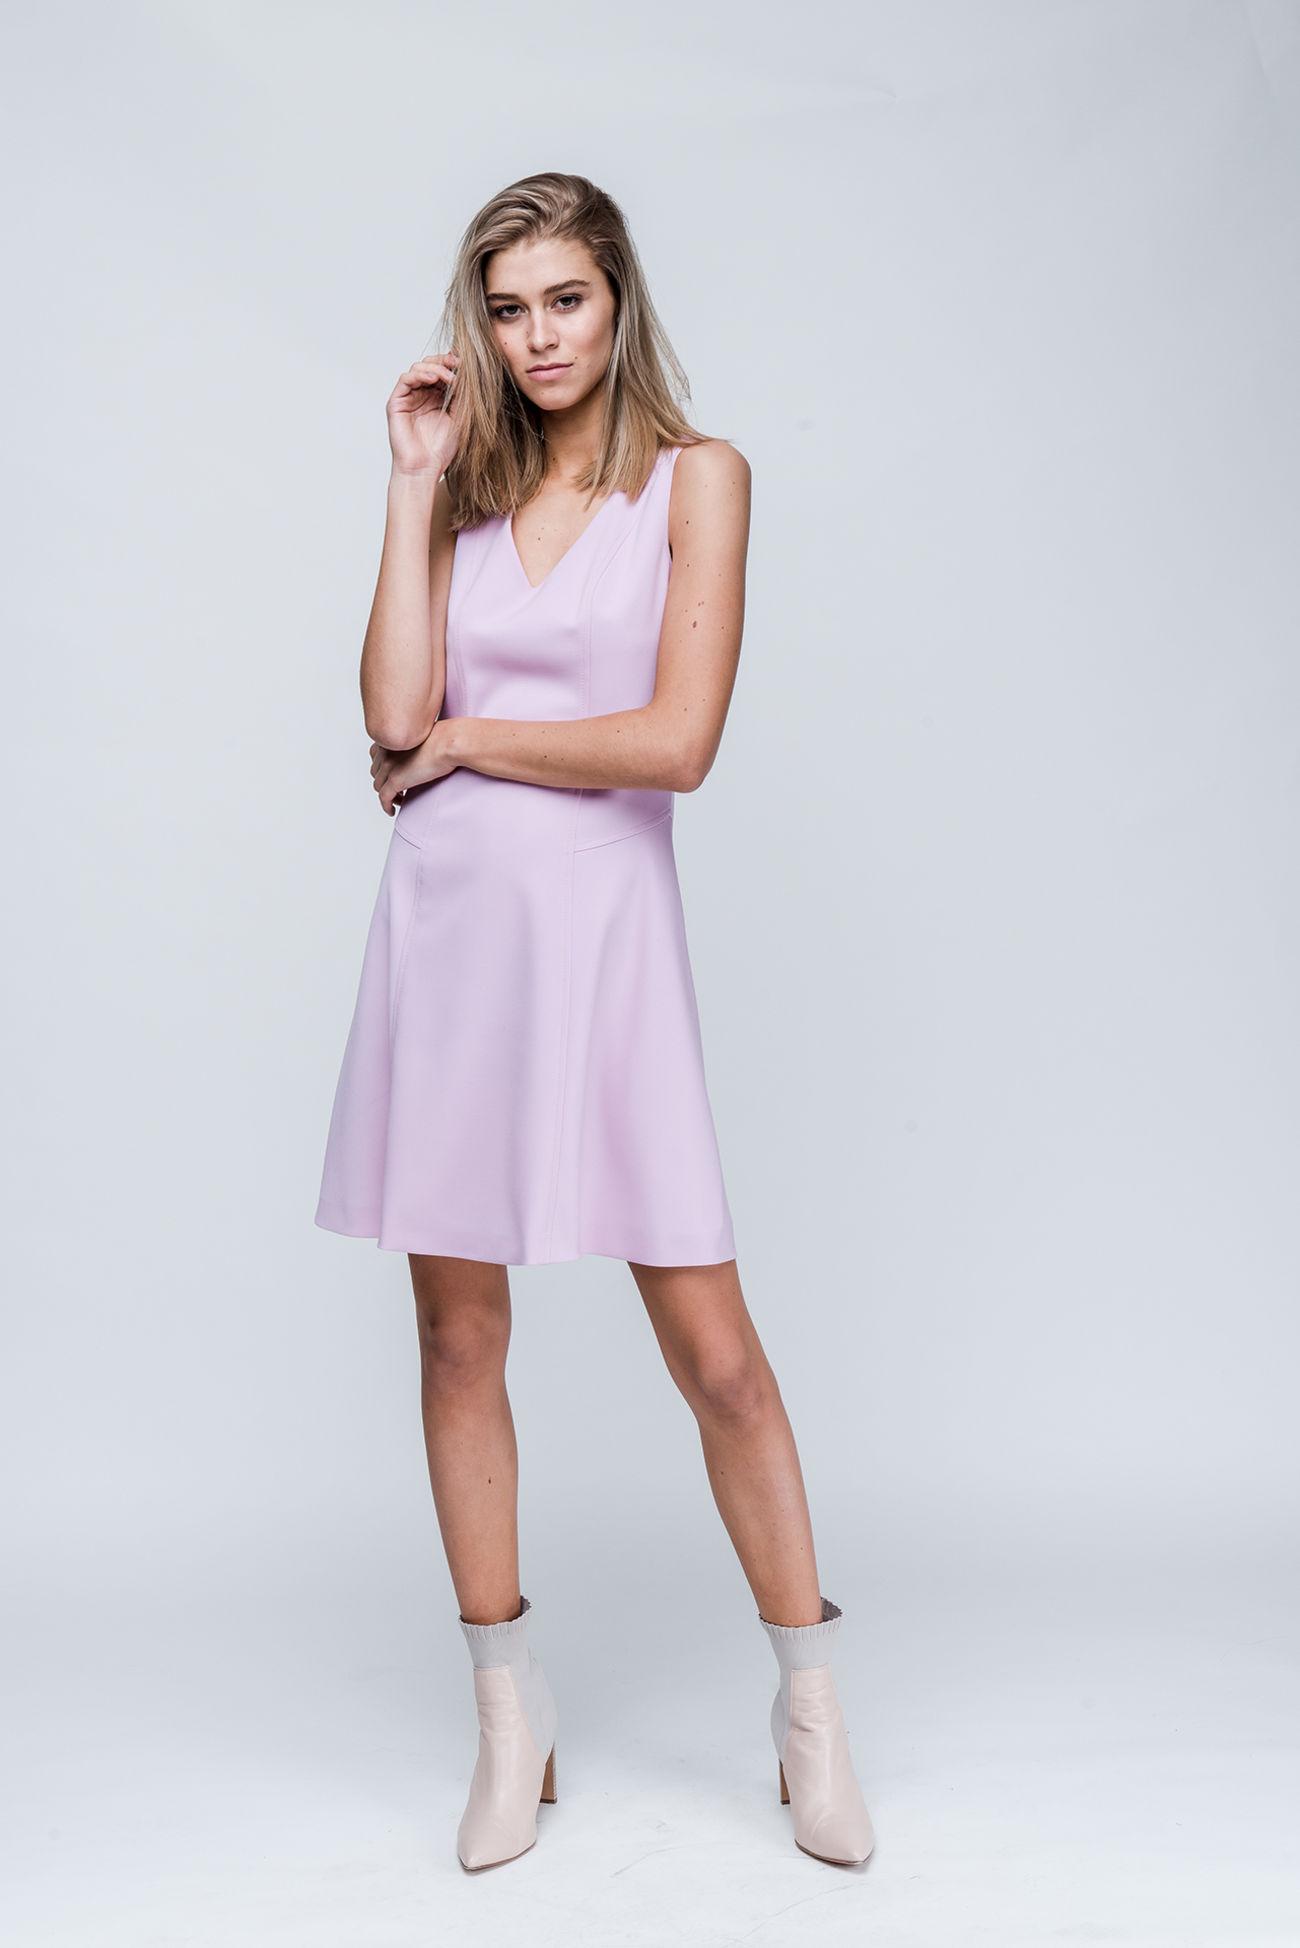 ee5142daa81 Kleid aus Grain de Poudre